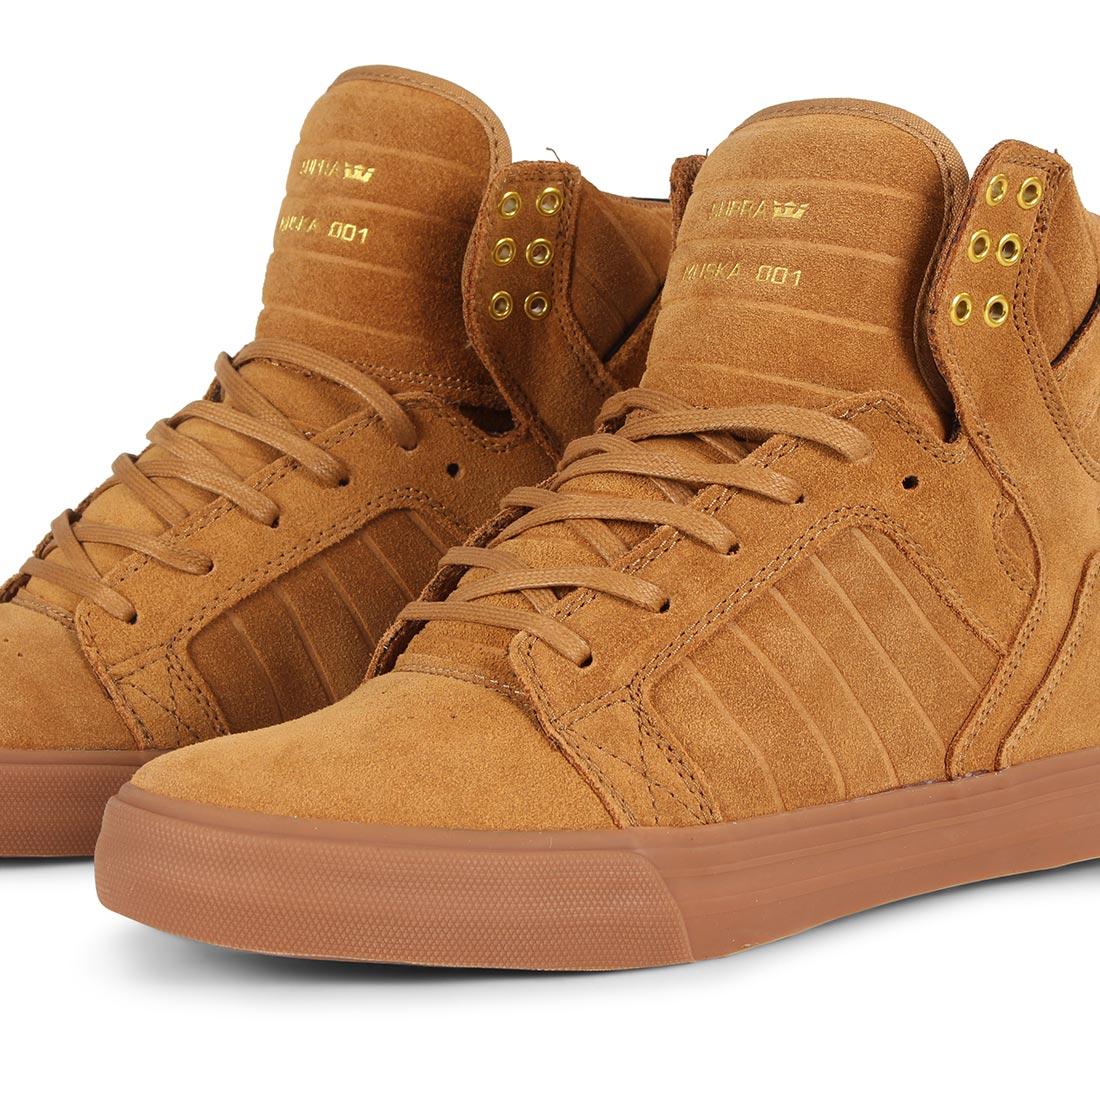 42e7ee56112 Supra Skytop Shoes - Tan / Lt Gum